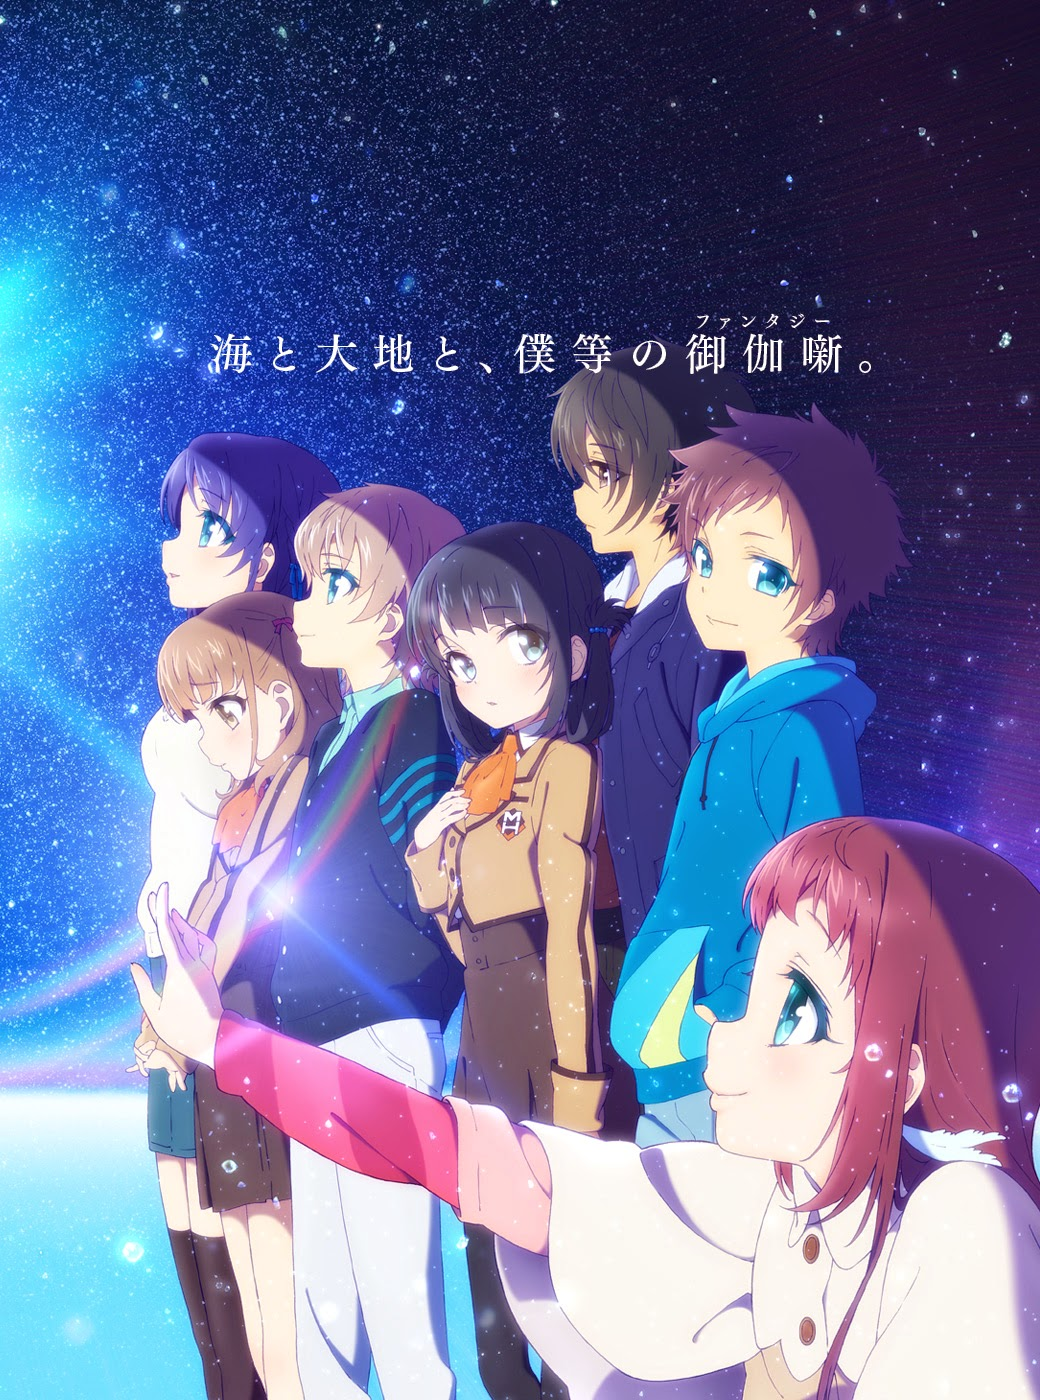 Lunatic Moe Anime Review Review Anime Nagi No Asukara